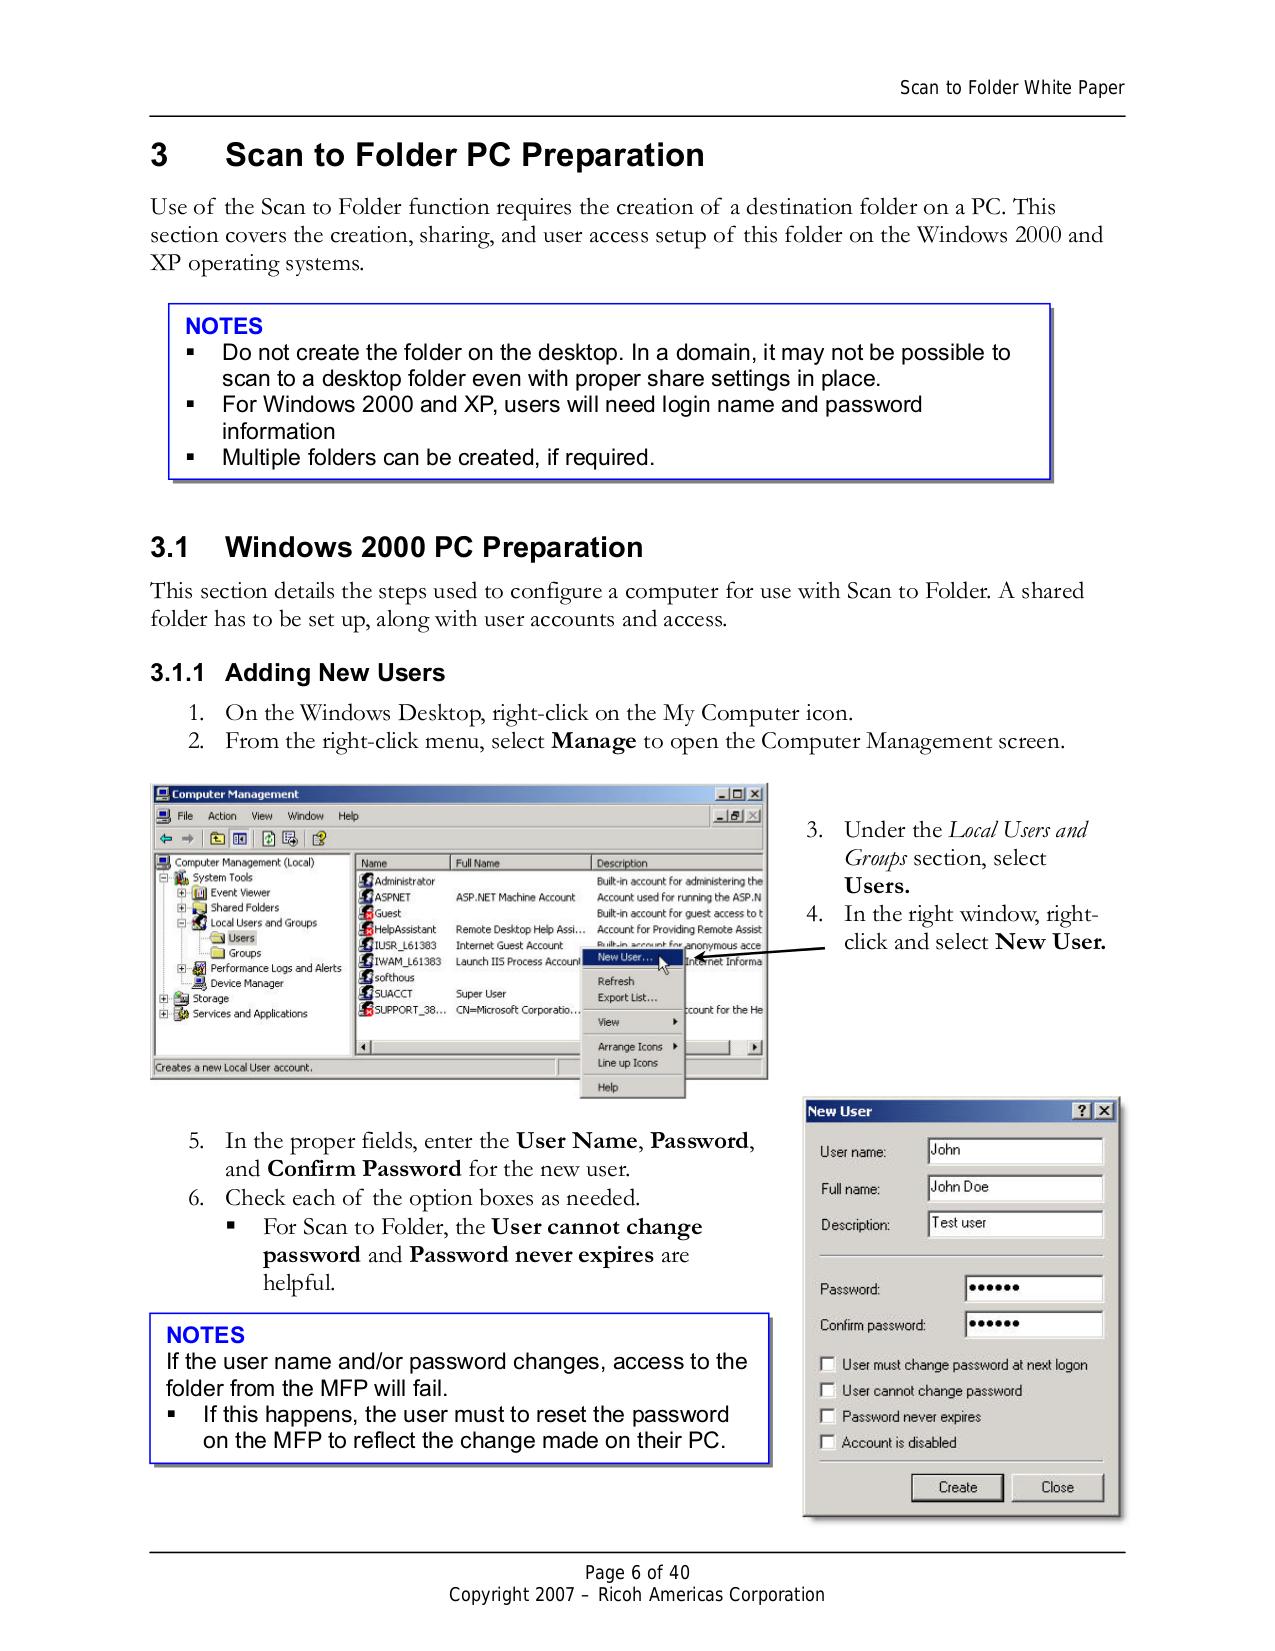 PDF manual for Ricoh Multifunction Printer Aficio 3045